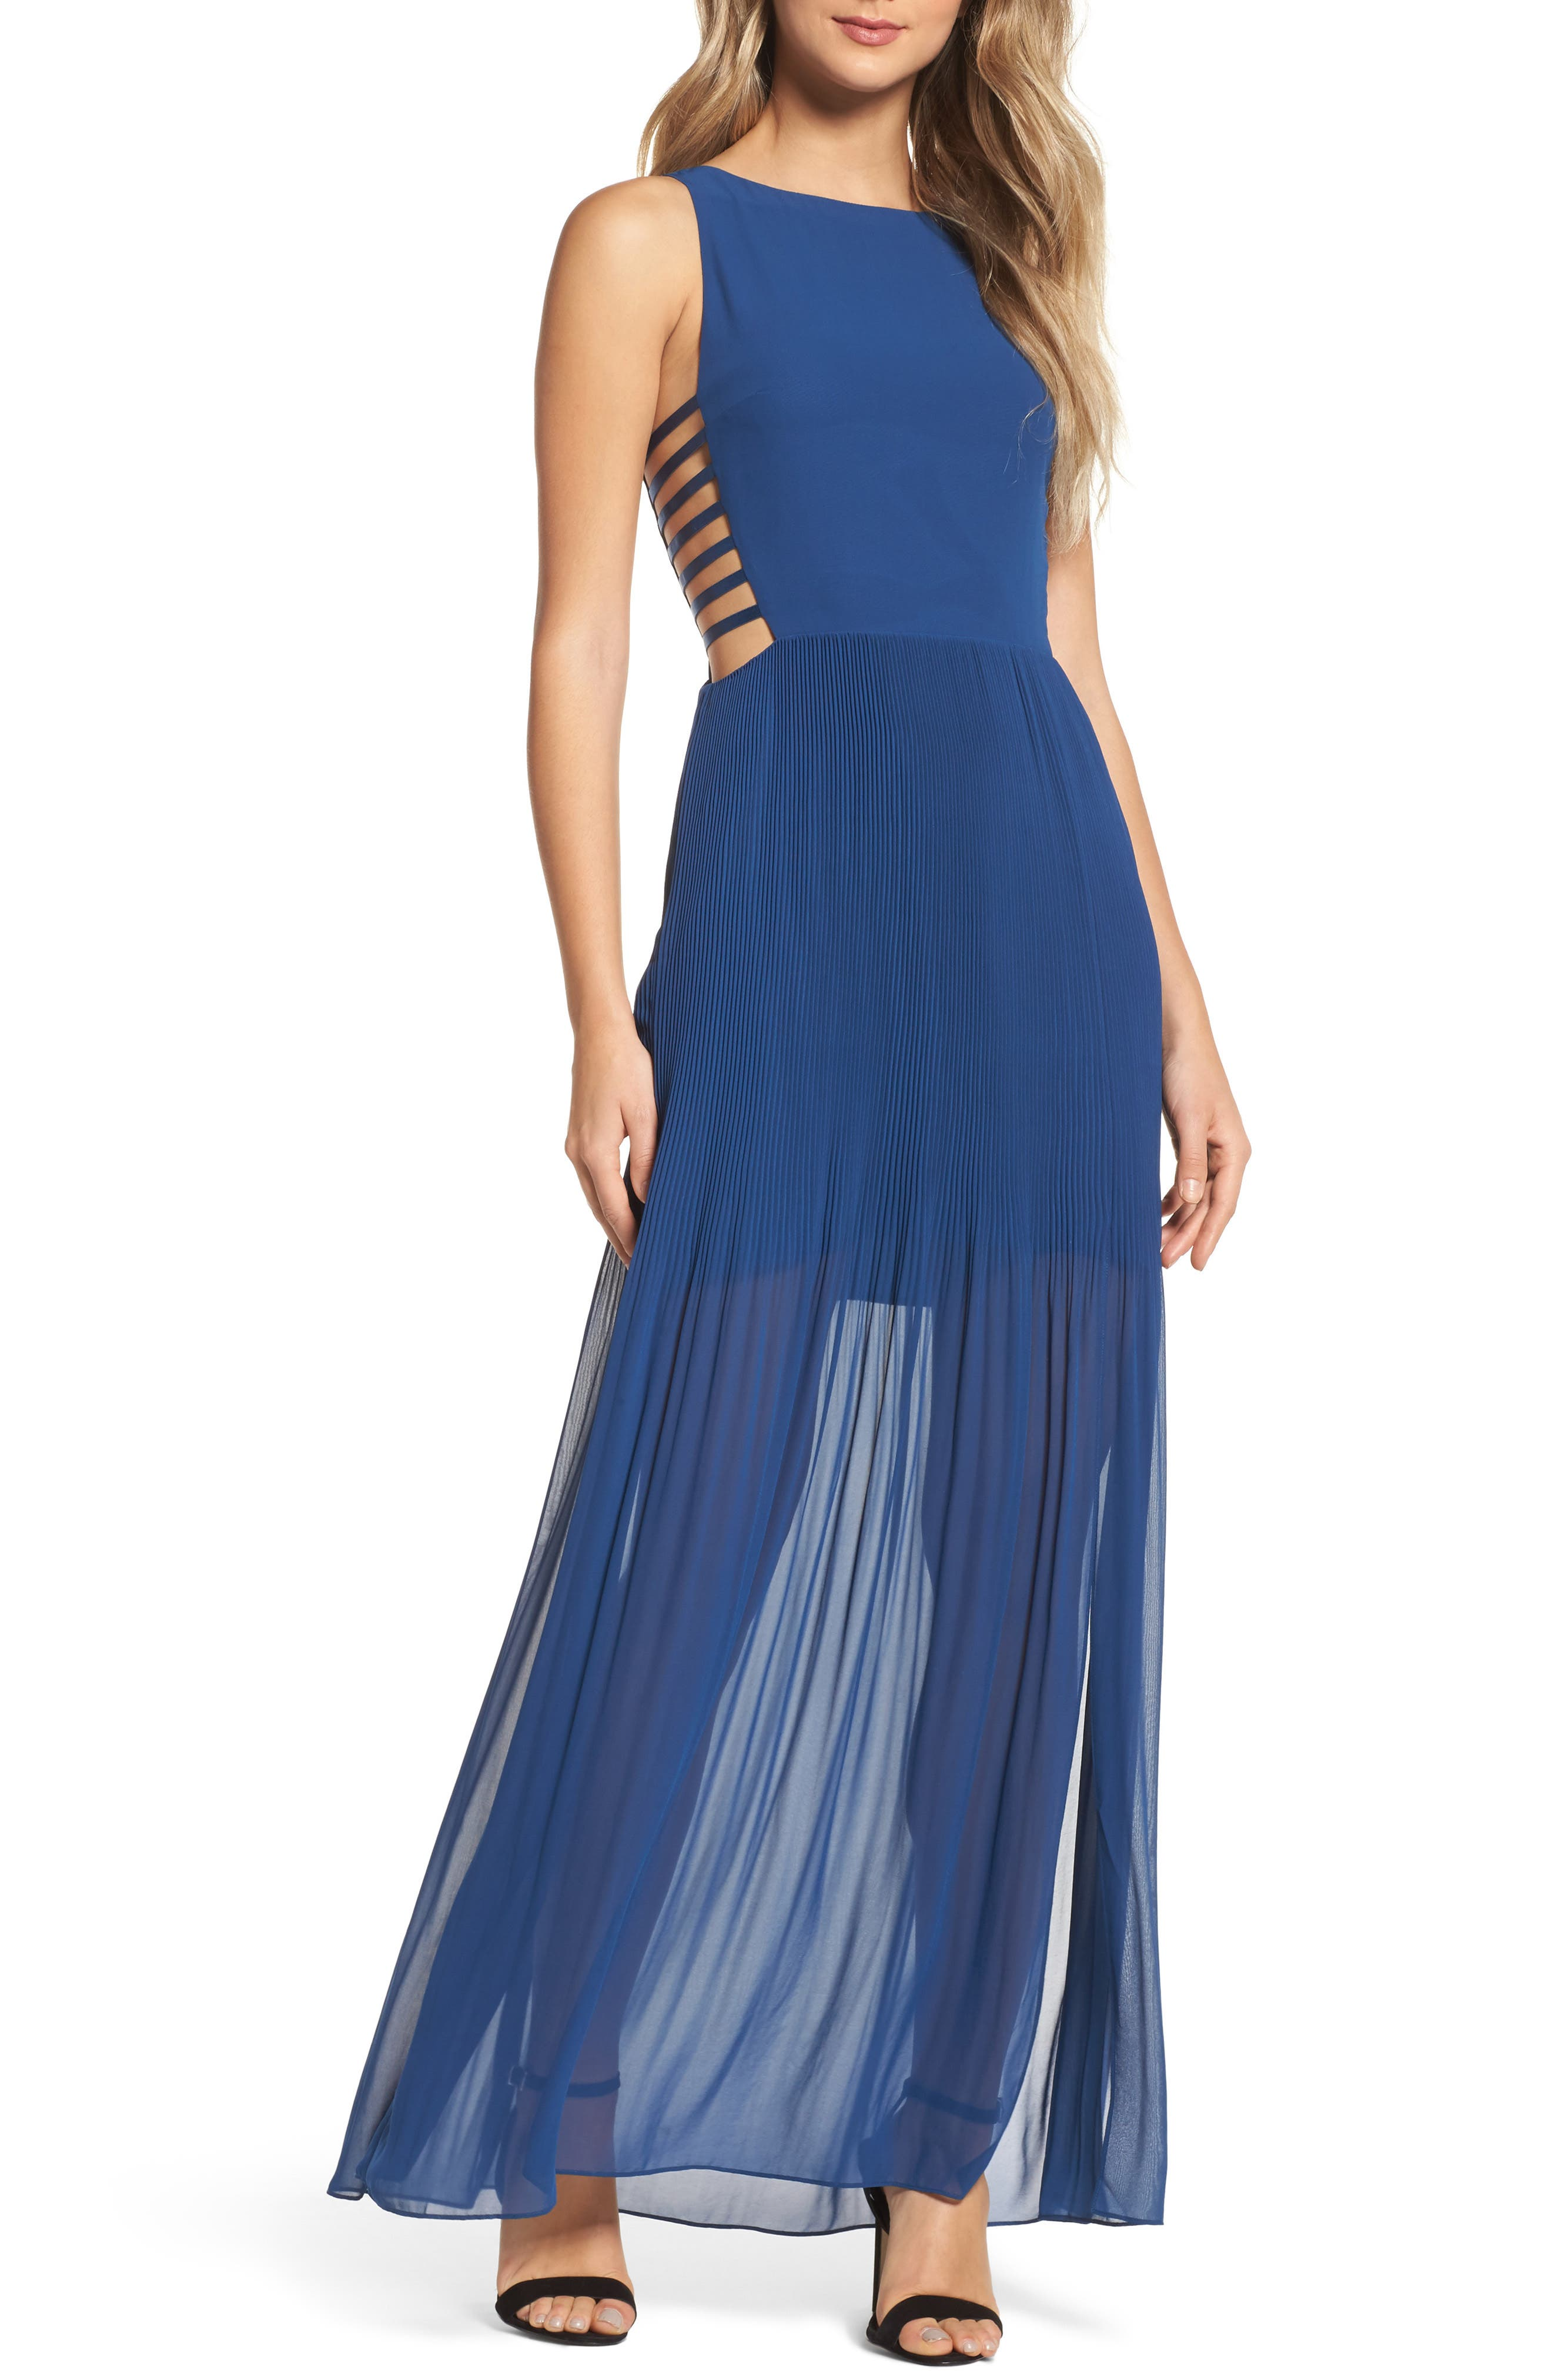 Sunset Blvd Maxi Dress,                             Main thumbnail 1, color,                             French Blue